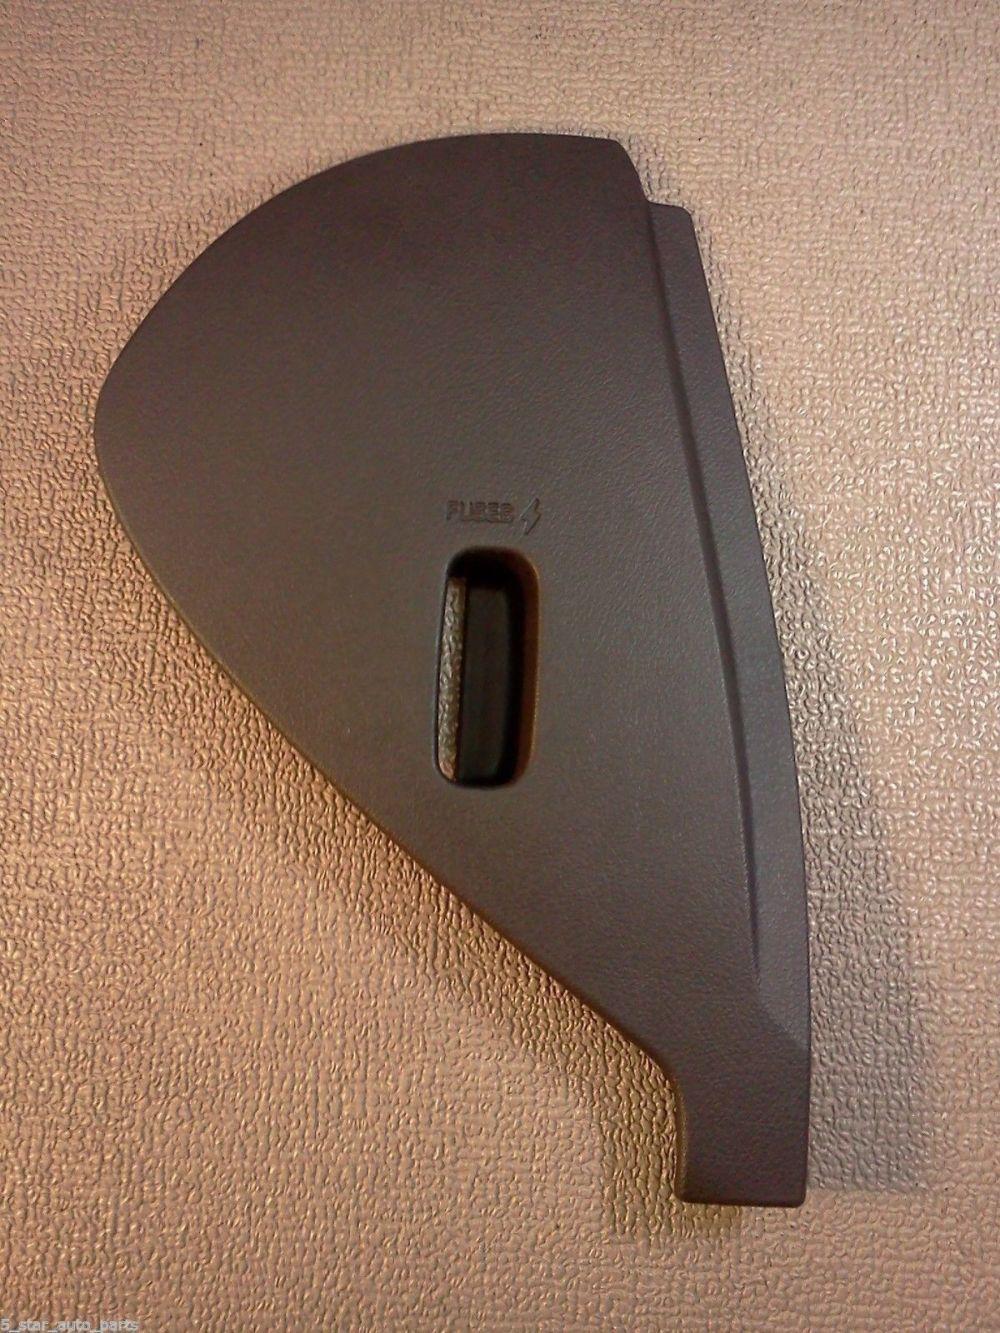 medium resolution of buick lucerne fuse box dash cover 2006 2007 2008 2009 2010 2011 color black